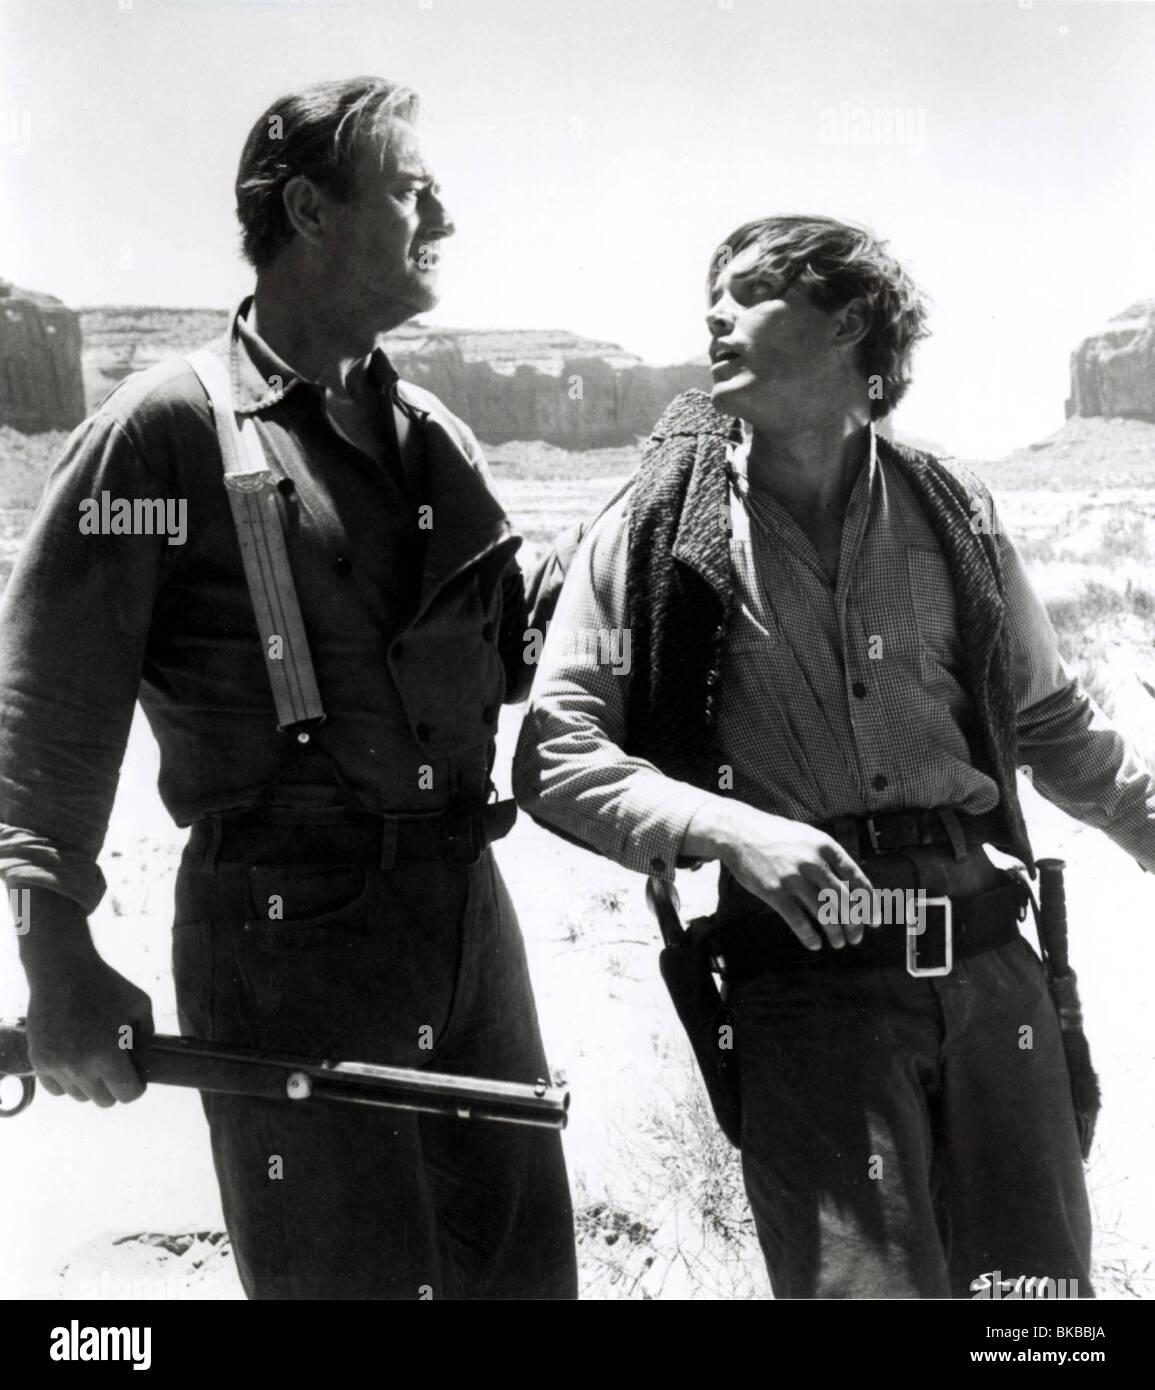 THE SEARCHERS (1956) JEFFREY HUNTER, JOHN WAYNE SEA 009P - Stock Image